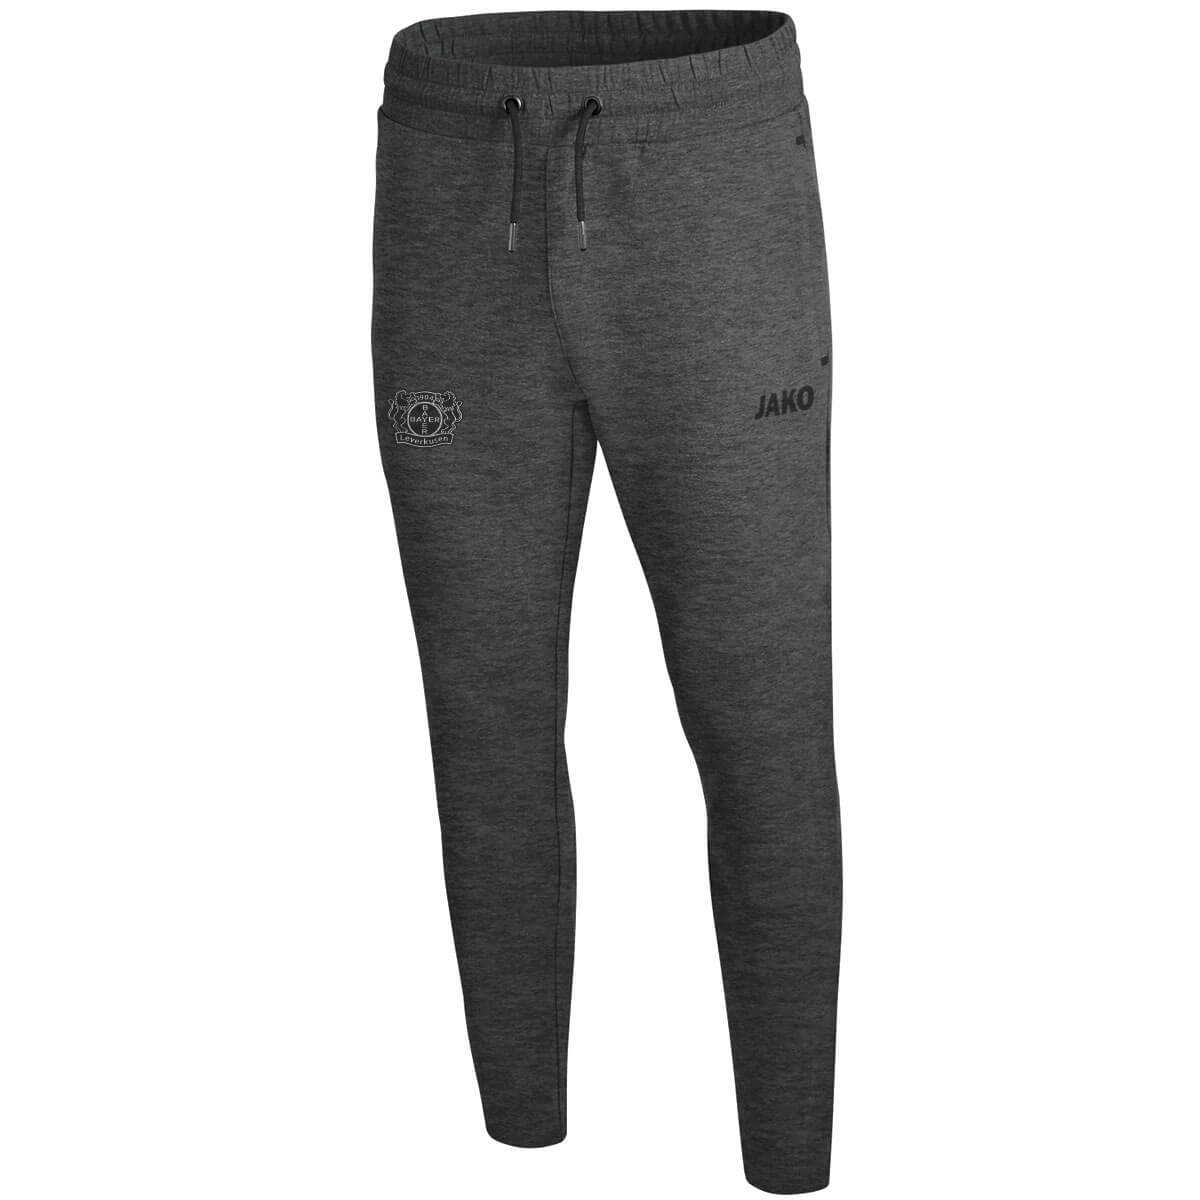 Jako B04 Jogginghose Premium Basics Herren BA8429I  | div. Größen / Farben